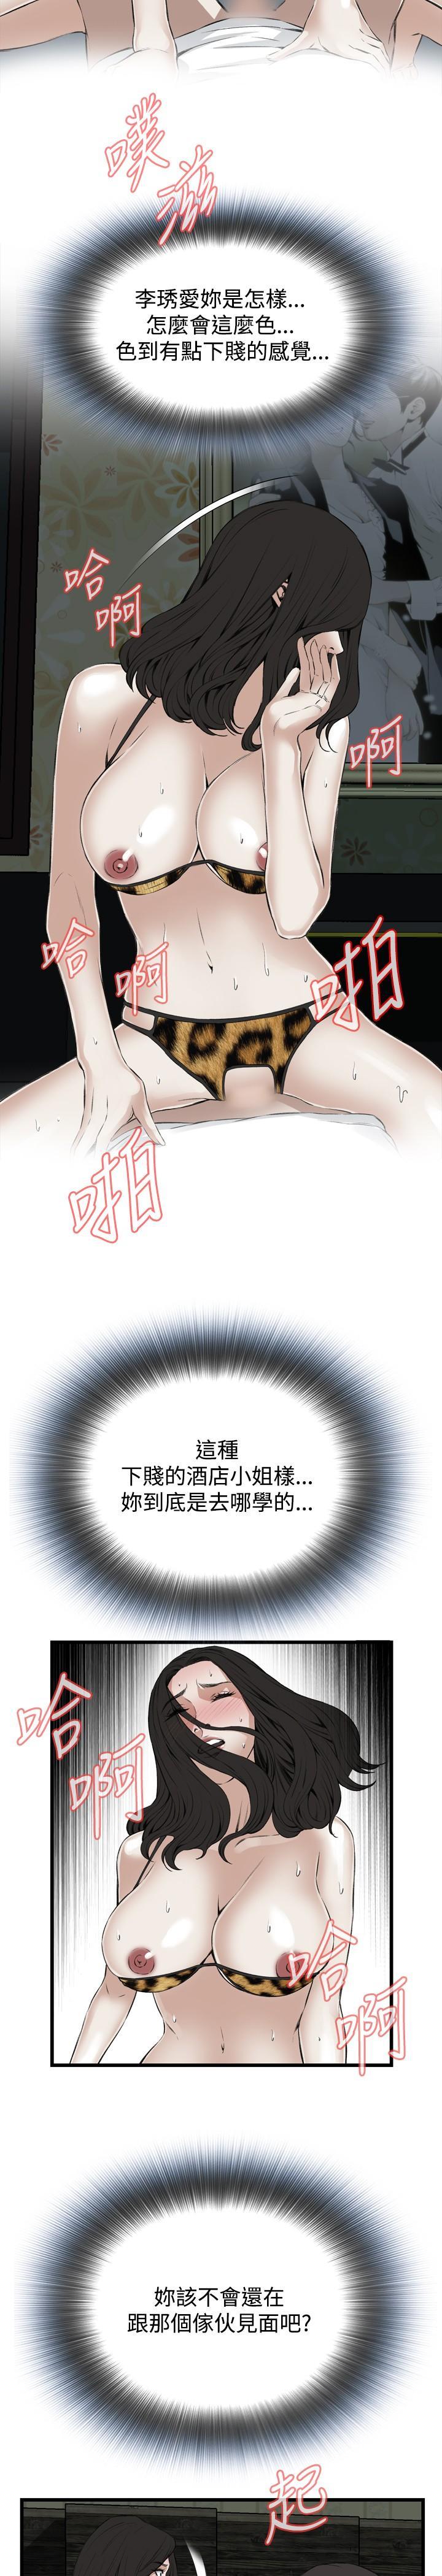 Take a Peek 偷窥 Ch.39~60 [Chinese]中文 473